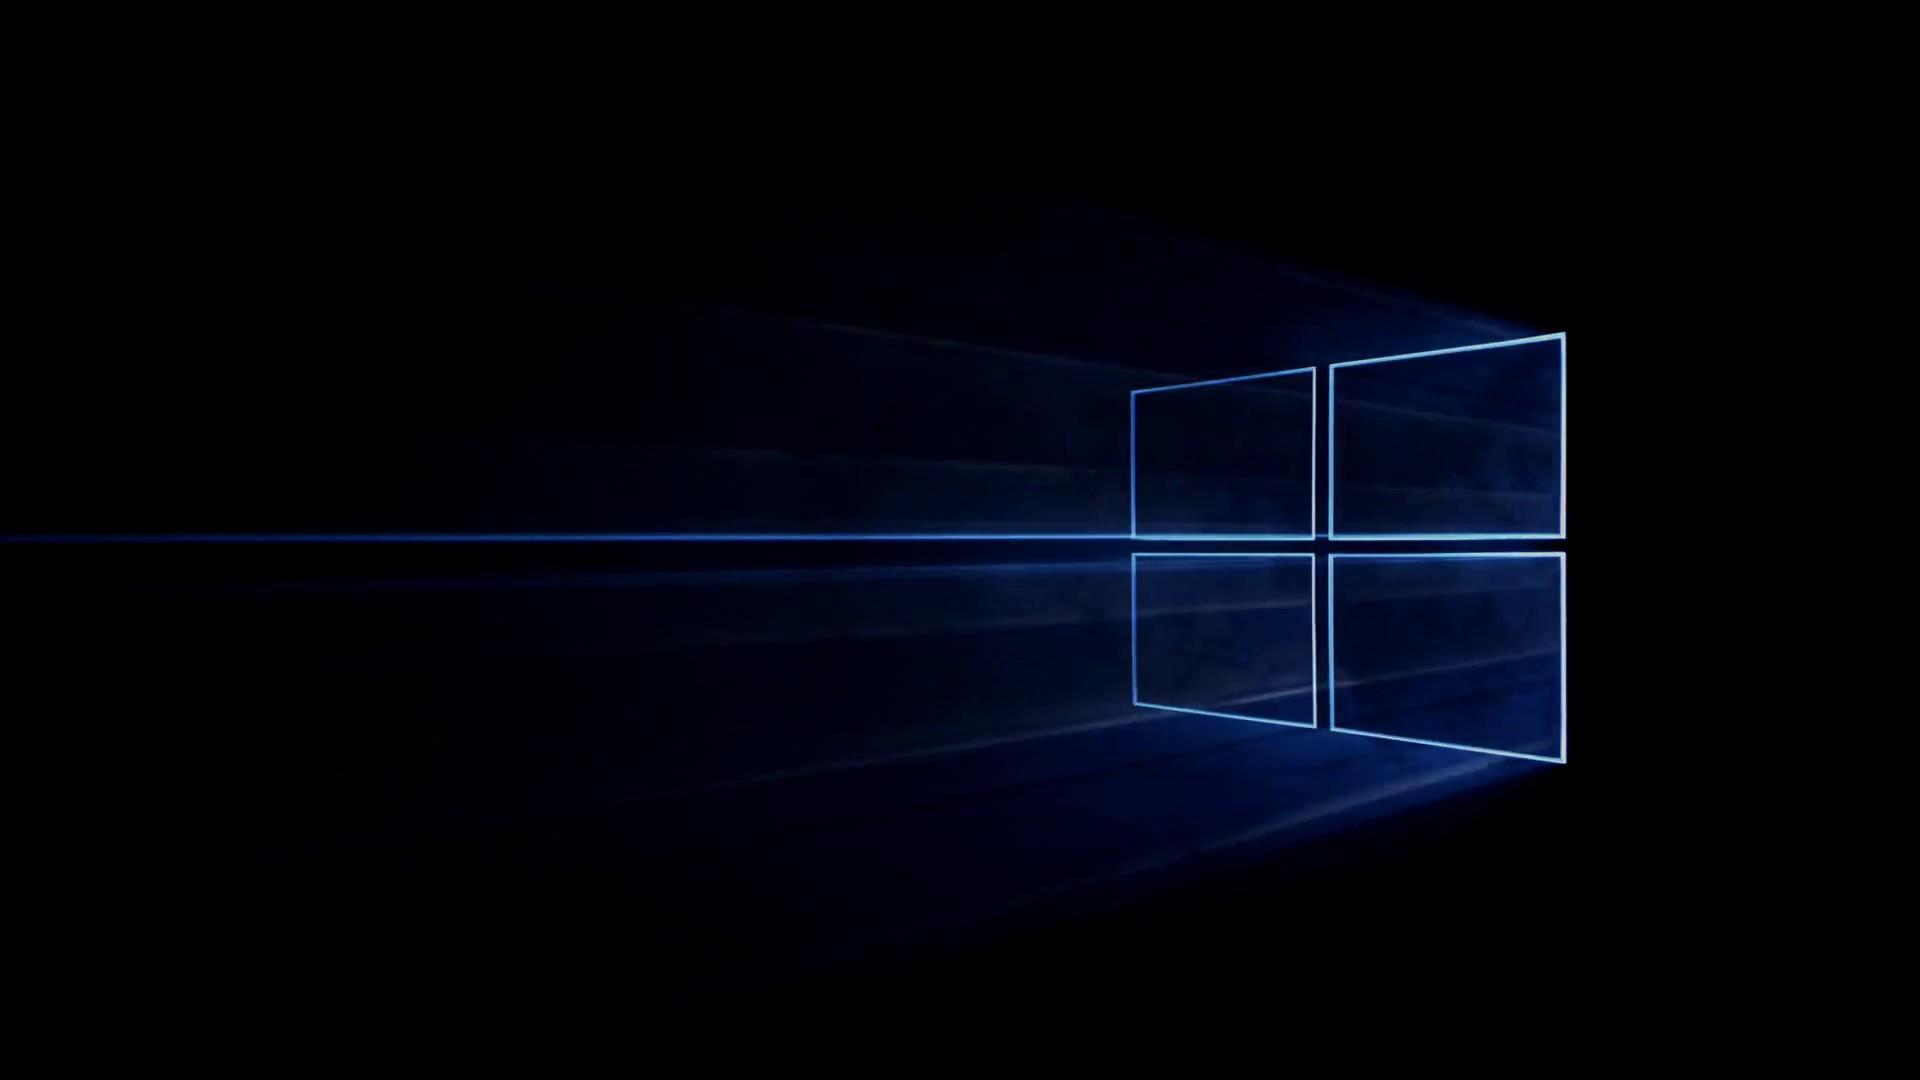 HD Windows 10 Logo Wallpapers